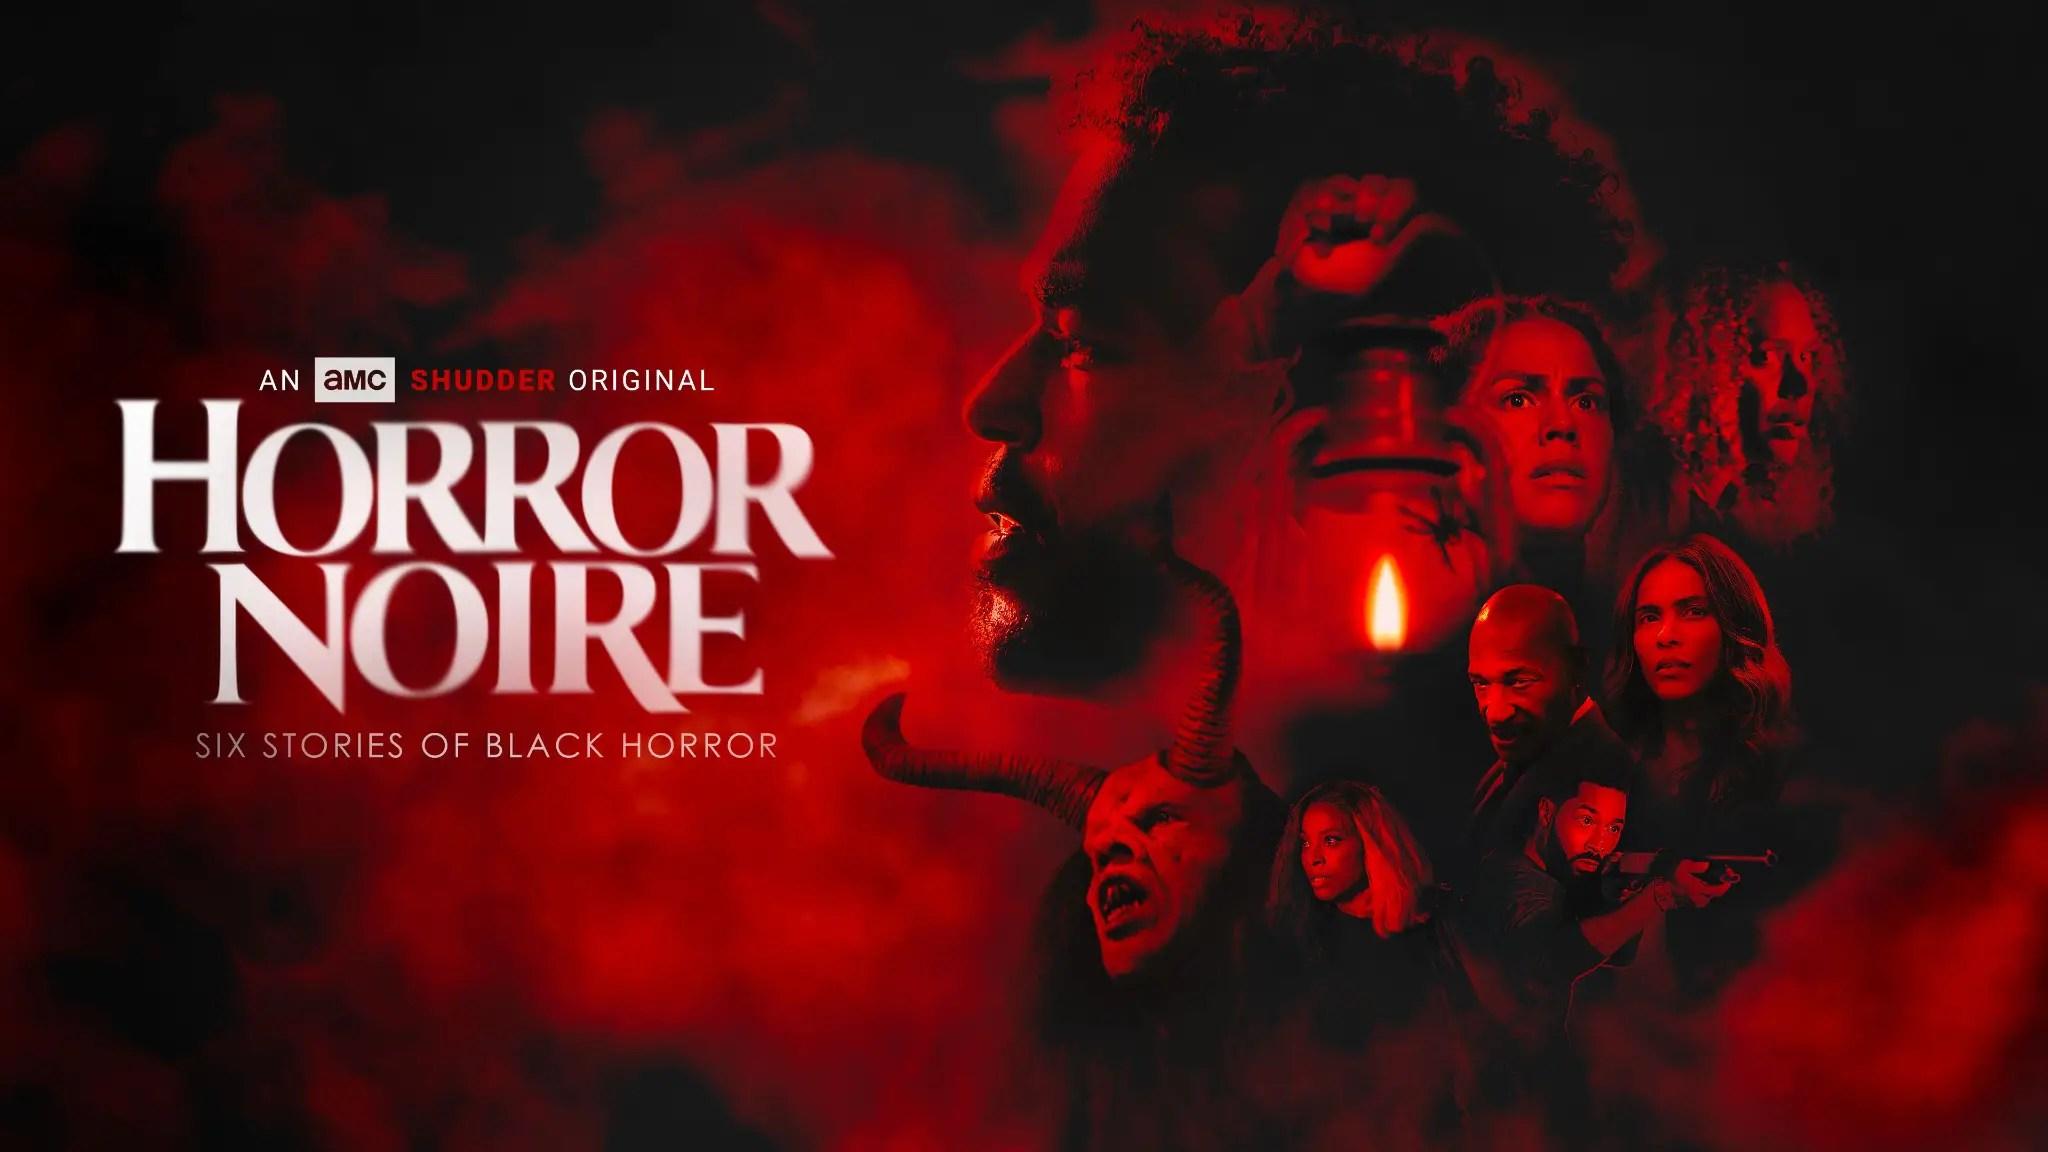 'Horror Noire' review: Anthology showcases Black horror